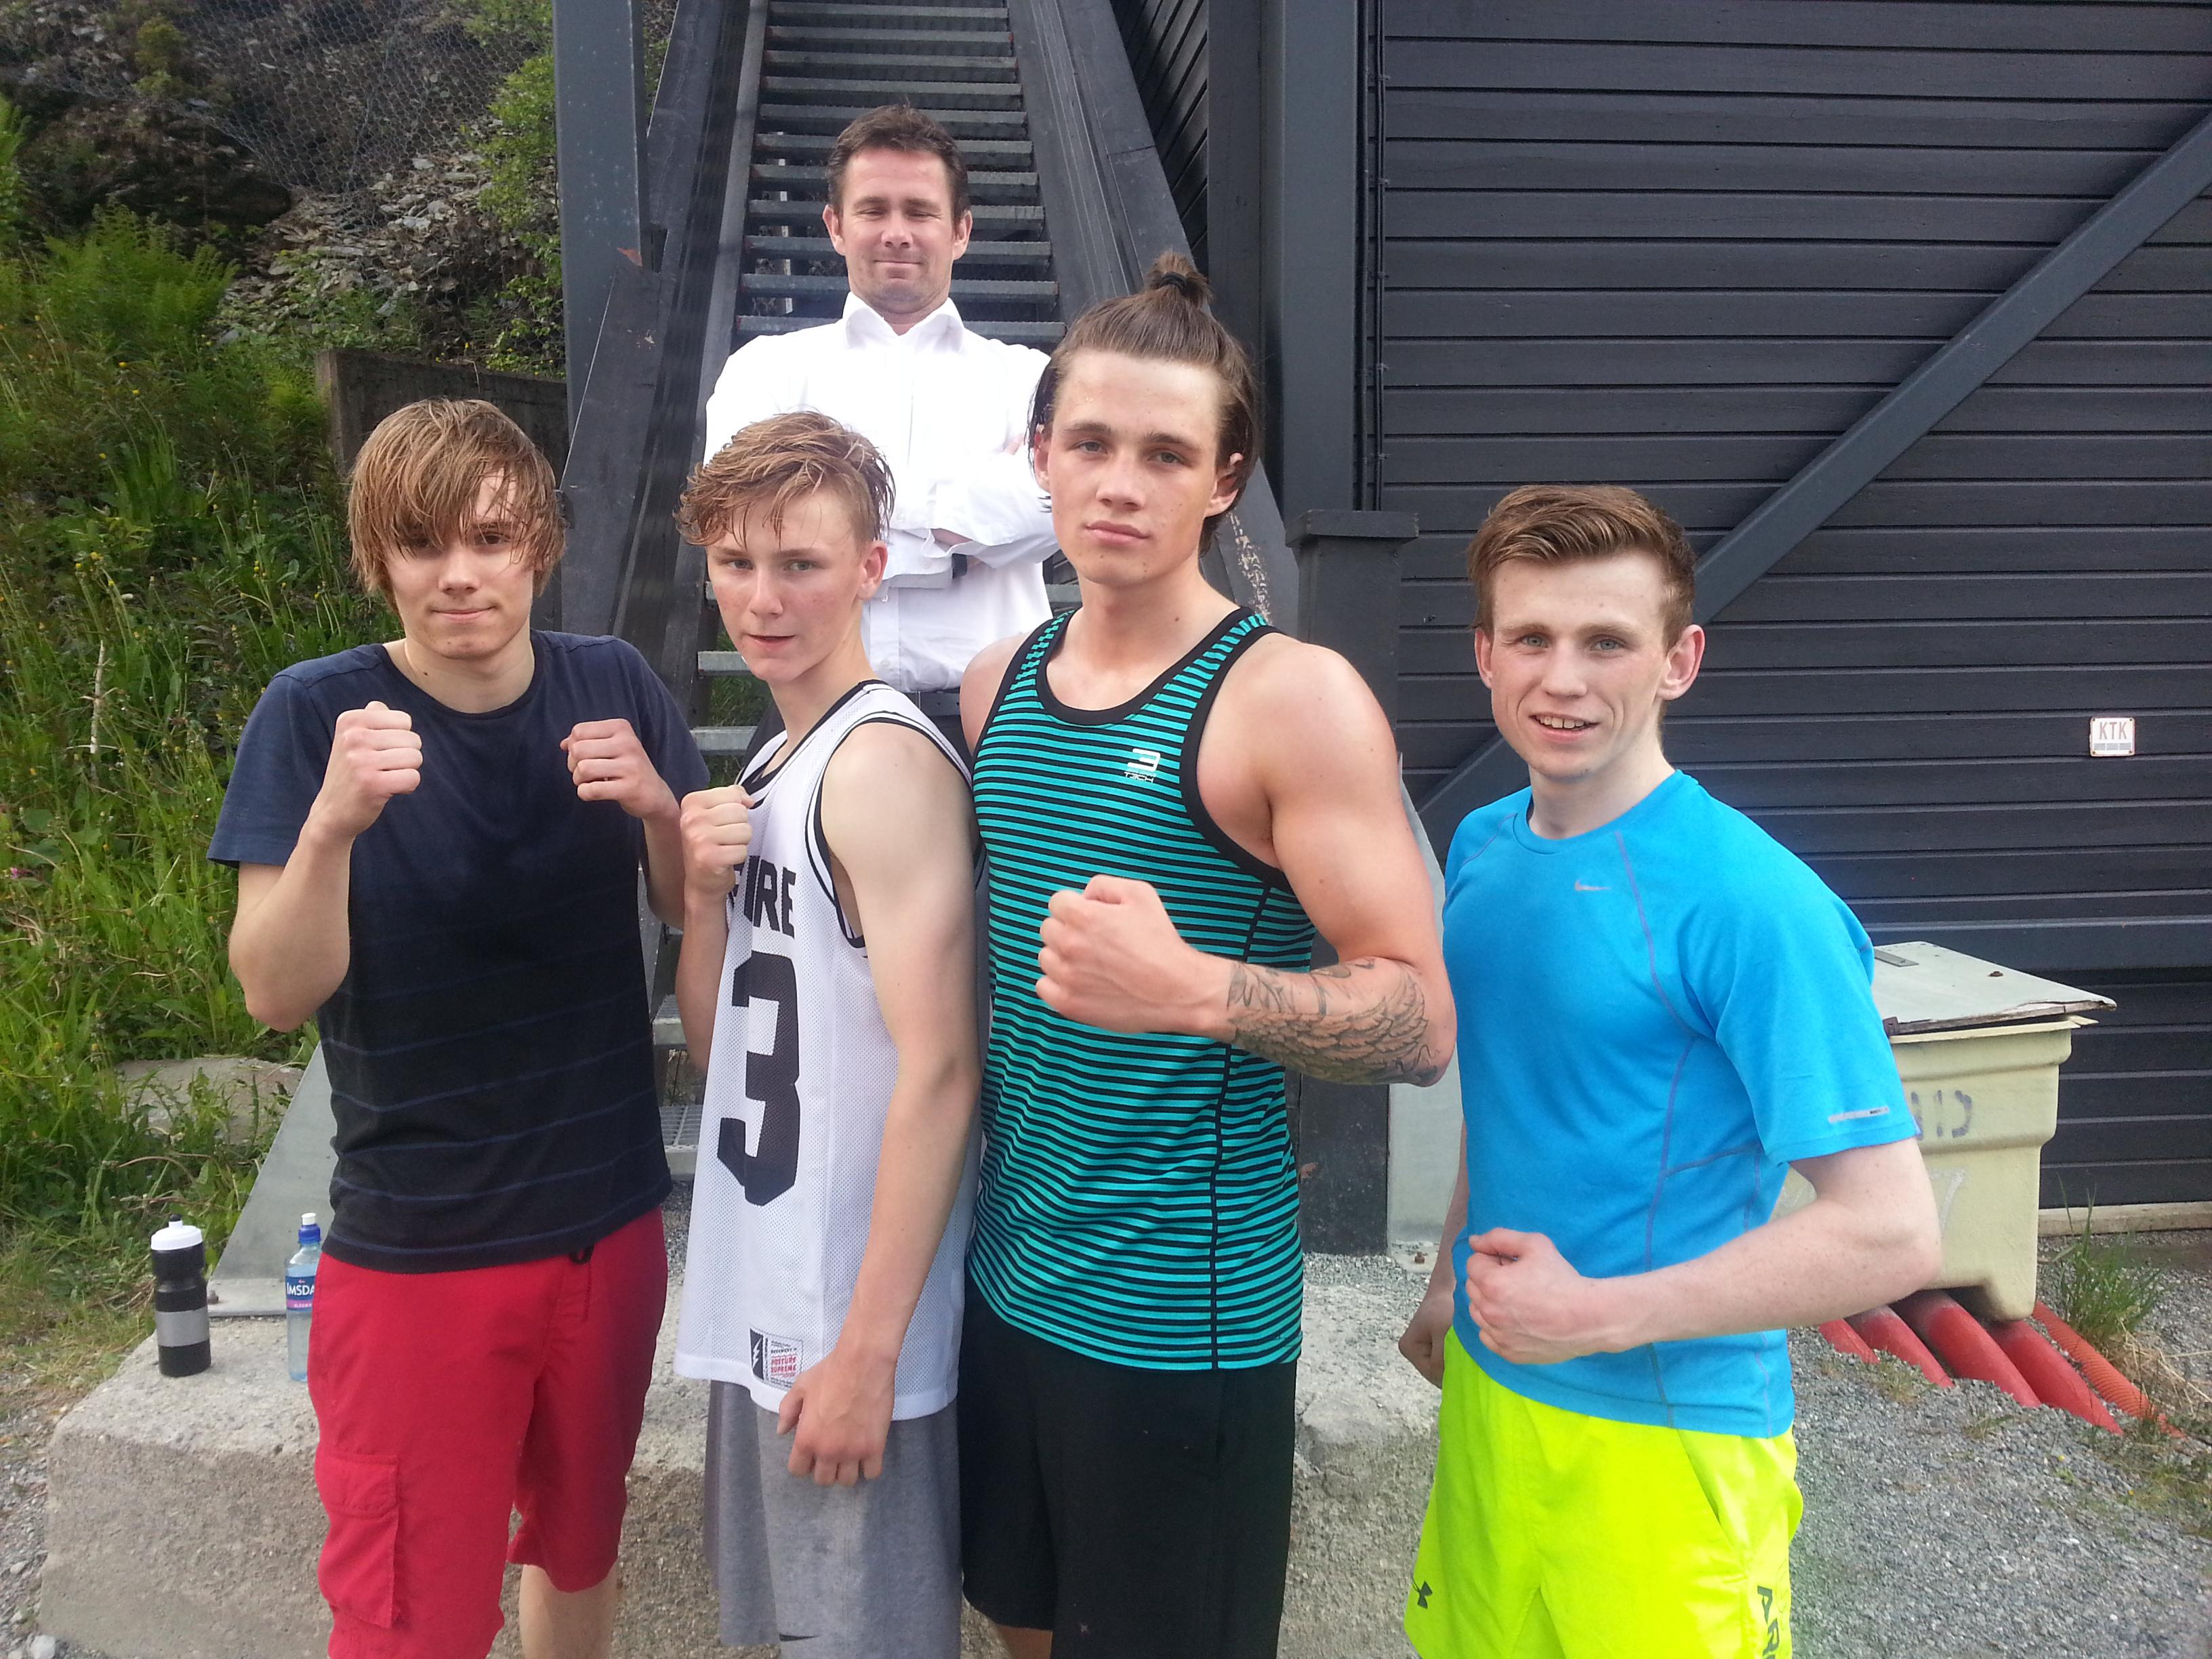 Team Trondheim trening i Granåsen